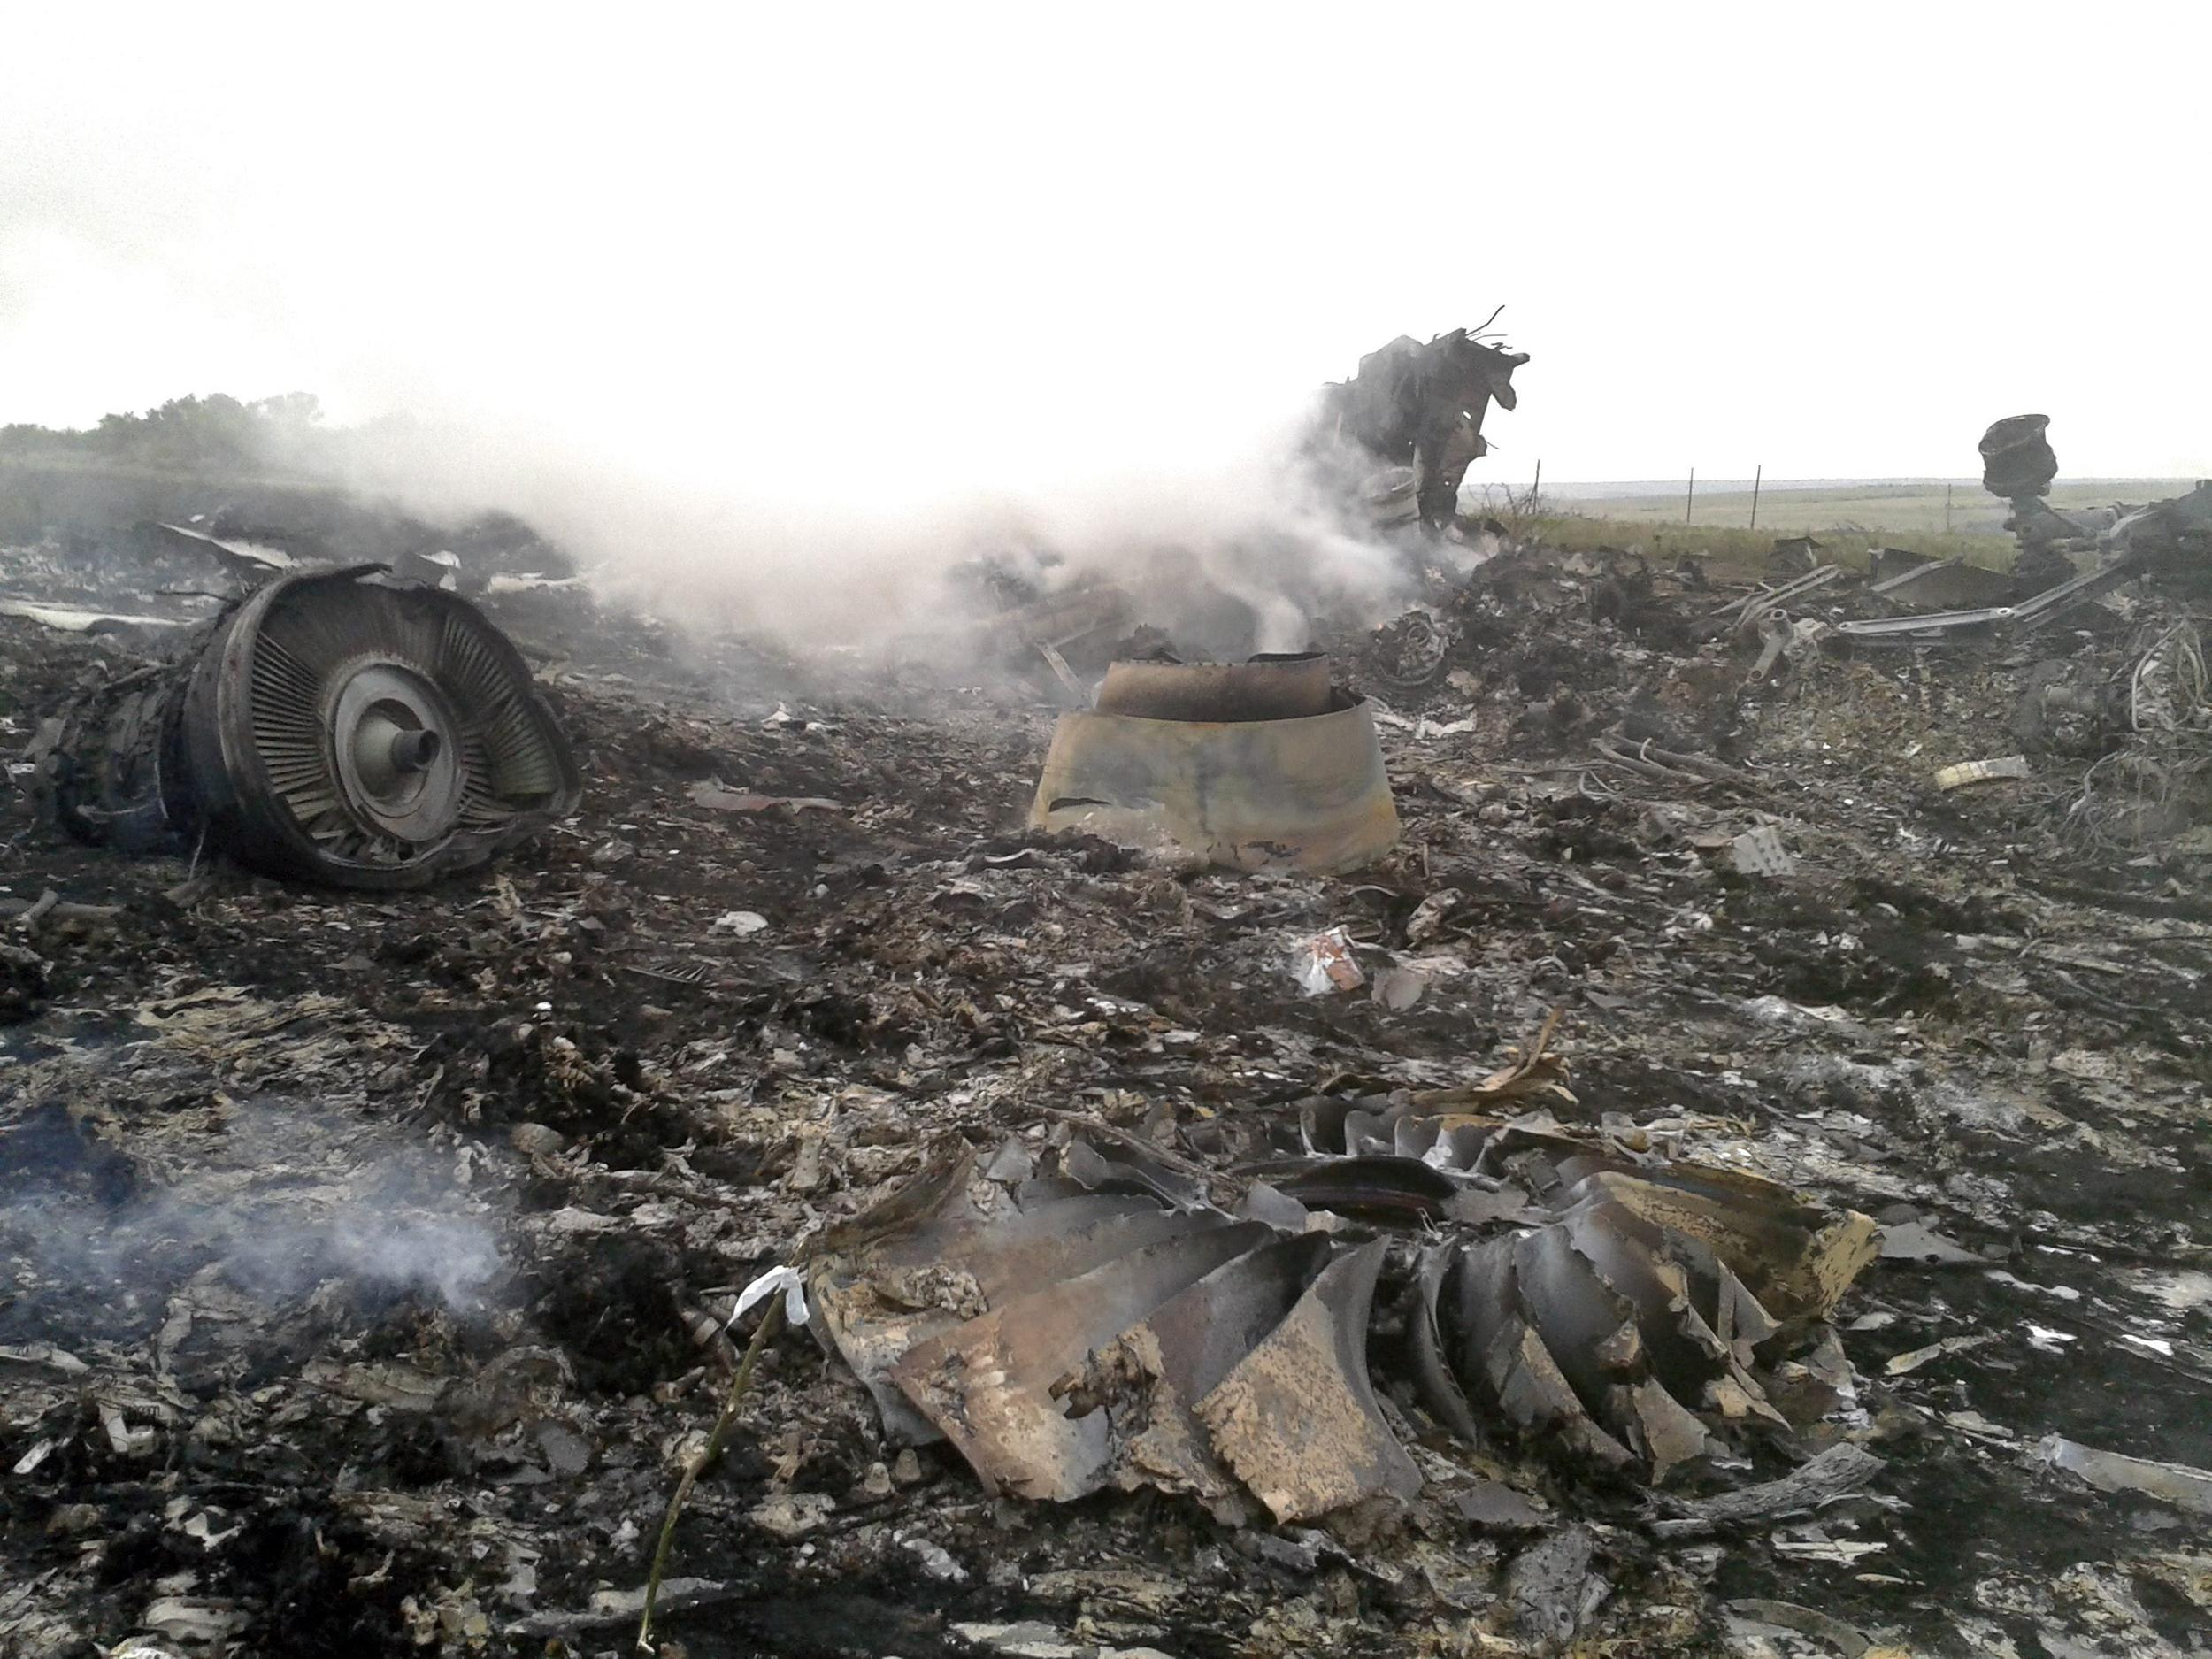 malaysia airlines crash debris - photo #38